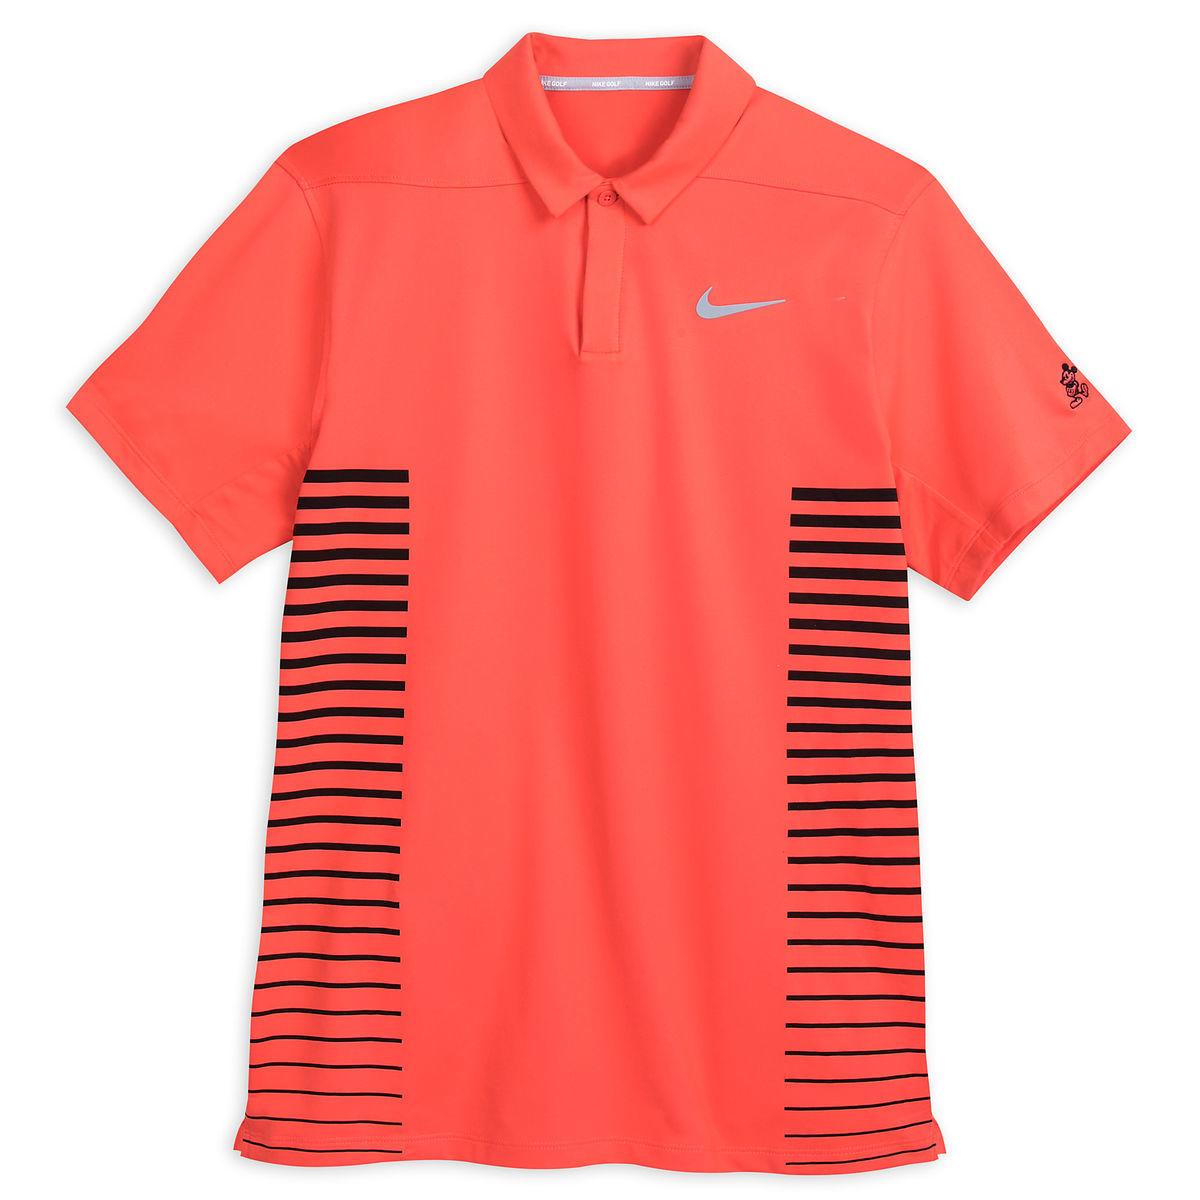 Disney Polo Shirt For Men Nike Golf Mickey Mouse Coral Stripe